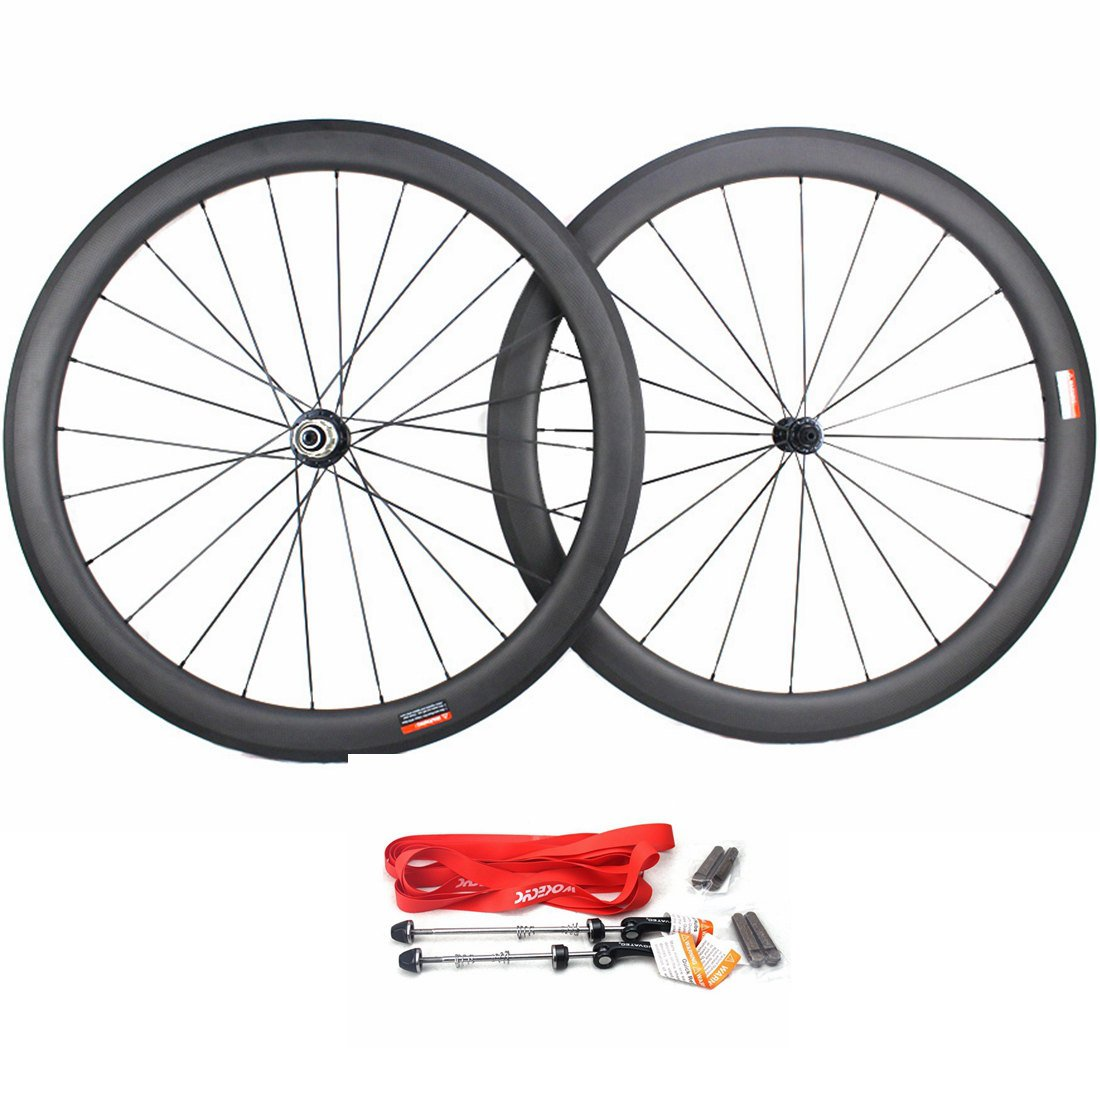 Road Bike Wheel set 50mm Clincher Carbon Fiber Matte 25mm Width For Shimano or Sram 10/11 Speed 700C Wheels